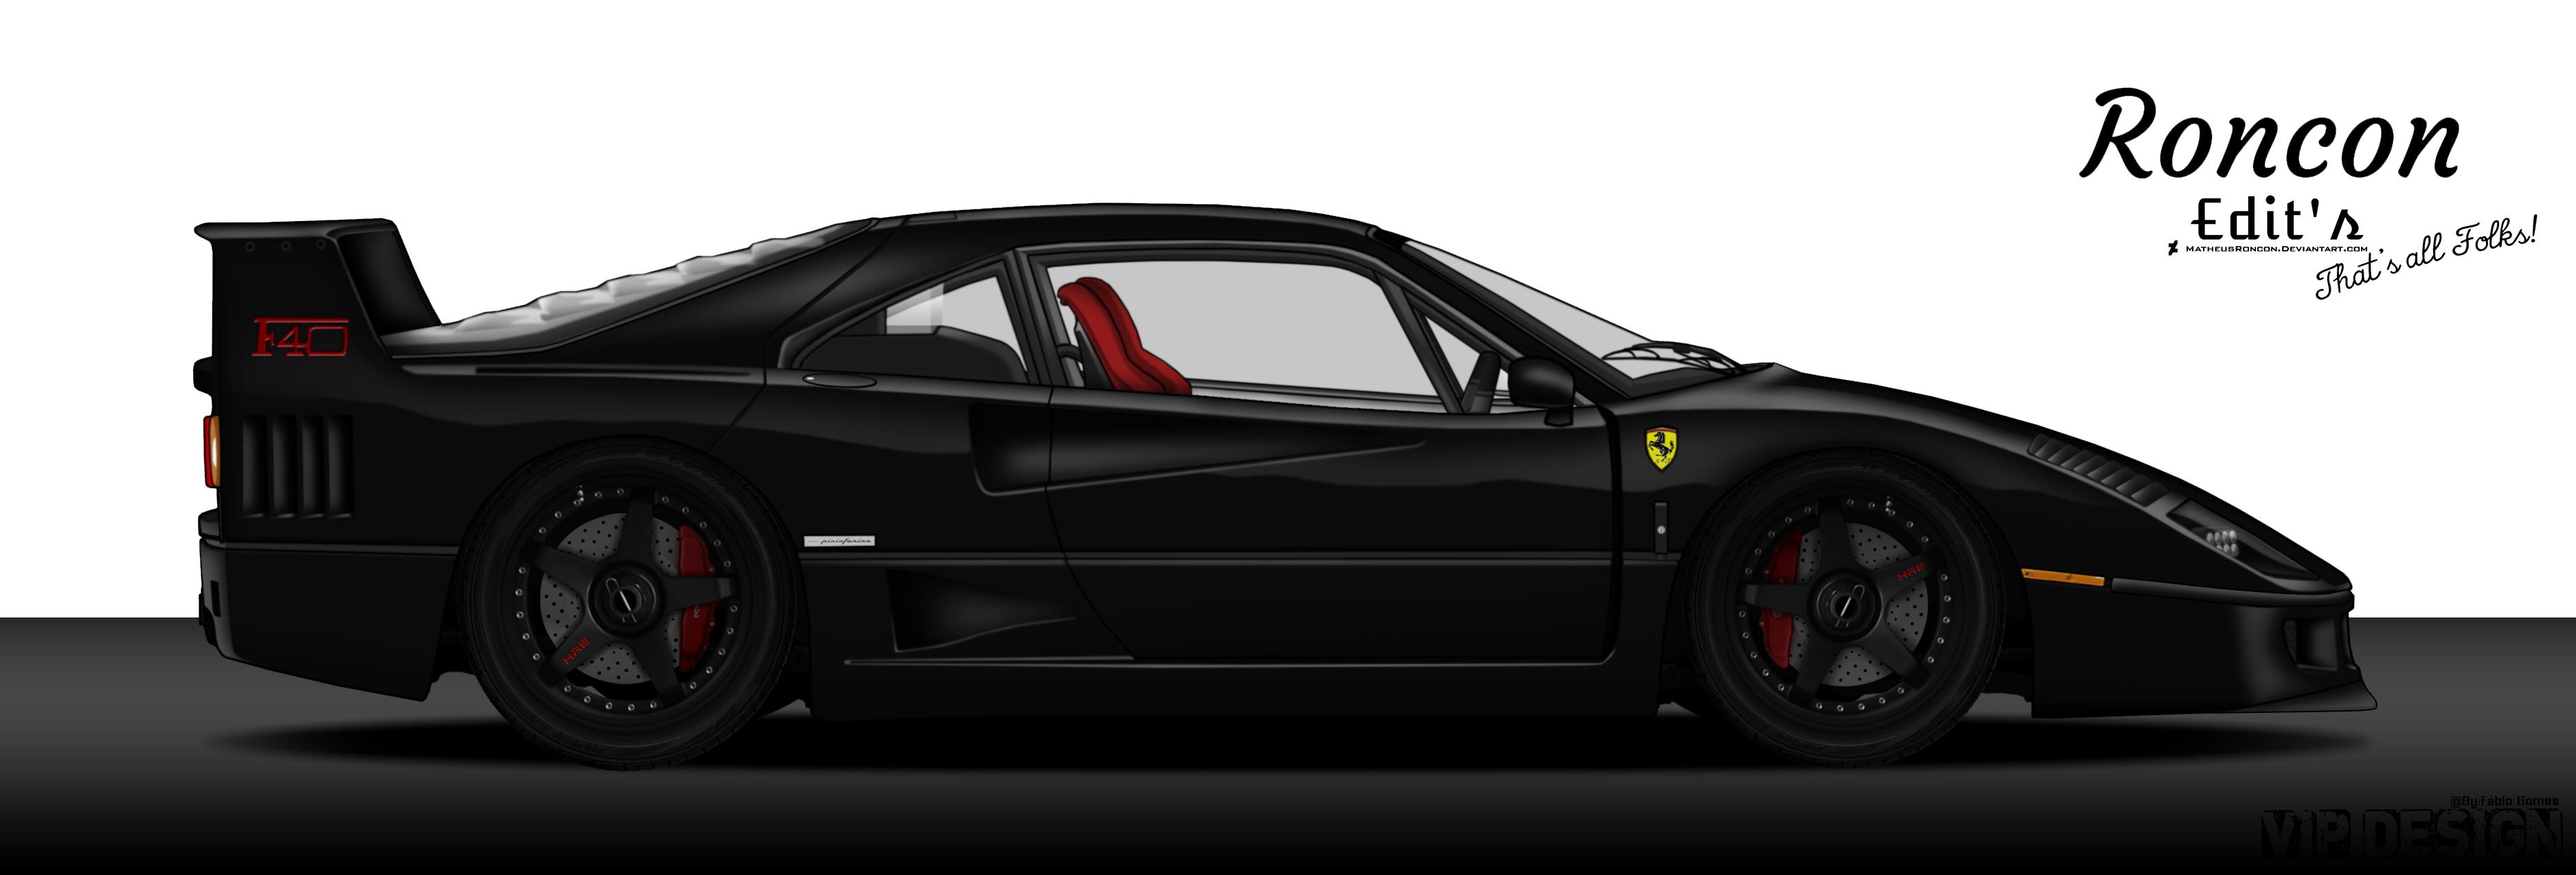 Ferrari F40 Gas Monkey By Matheusroncon On Deviantart